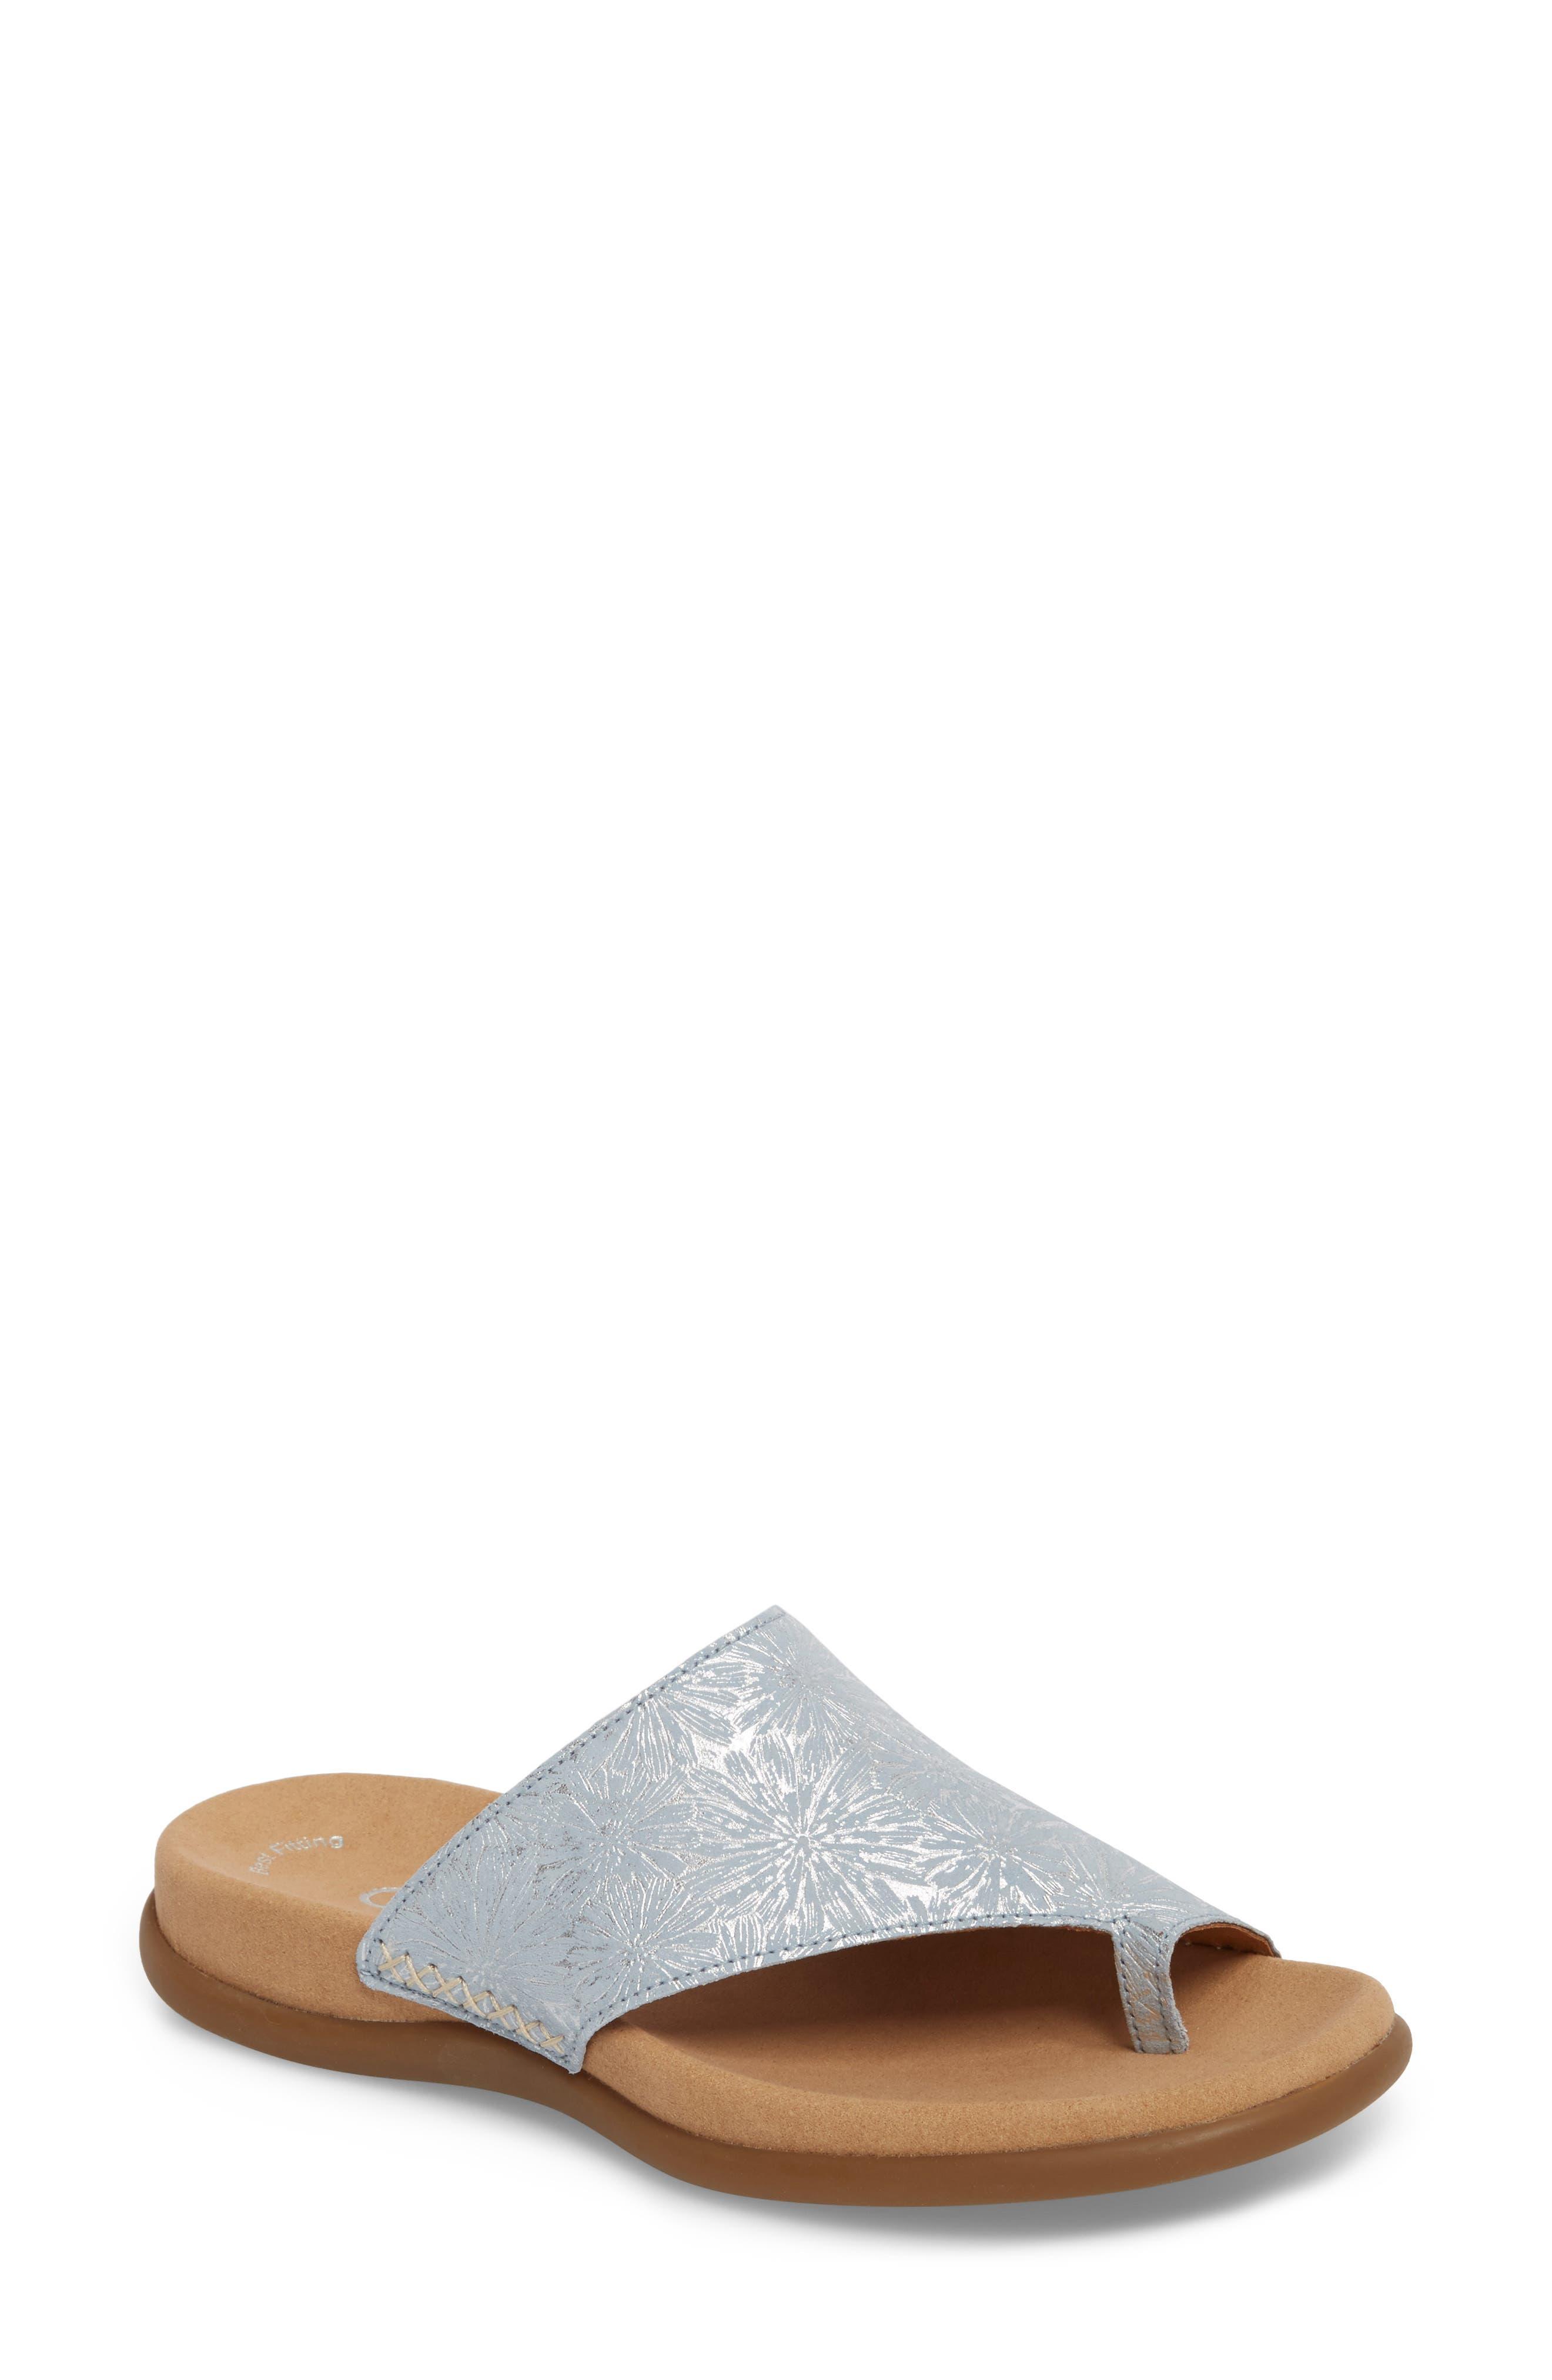 Sandal,                             Main thumbnail 1, color,                             BLUE METALLIC LEATHER